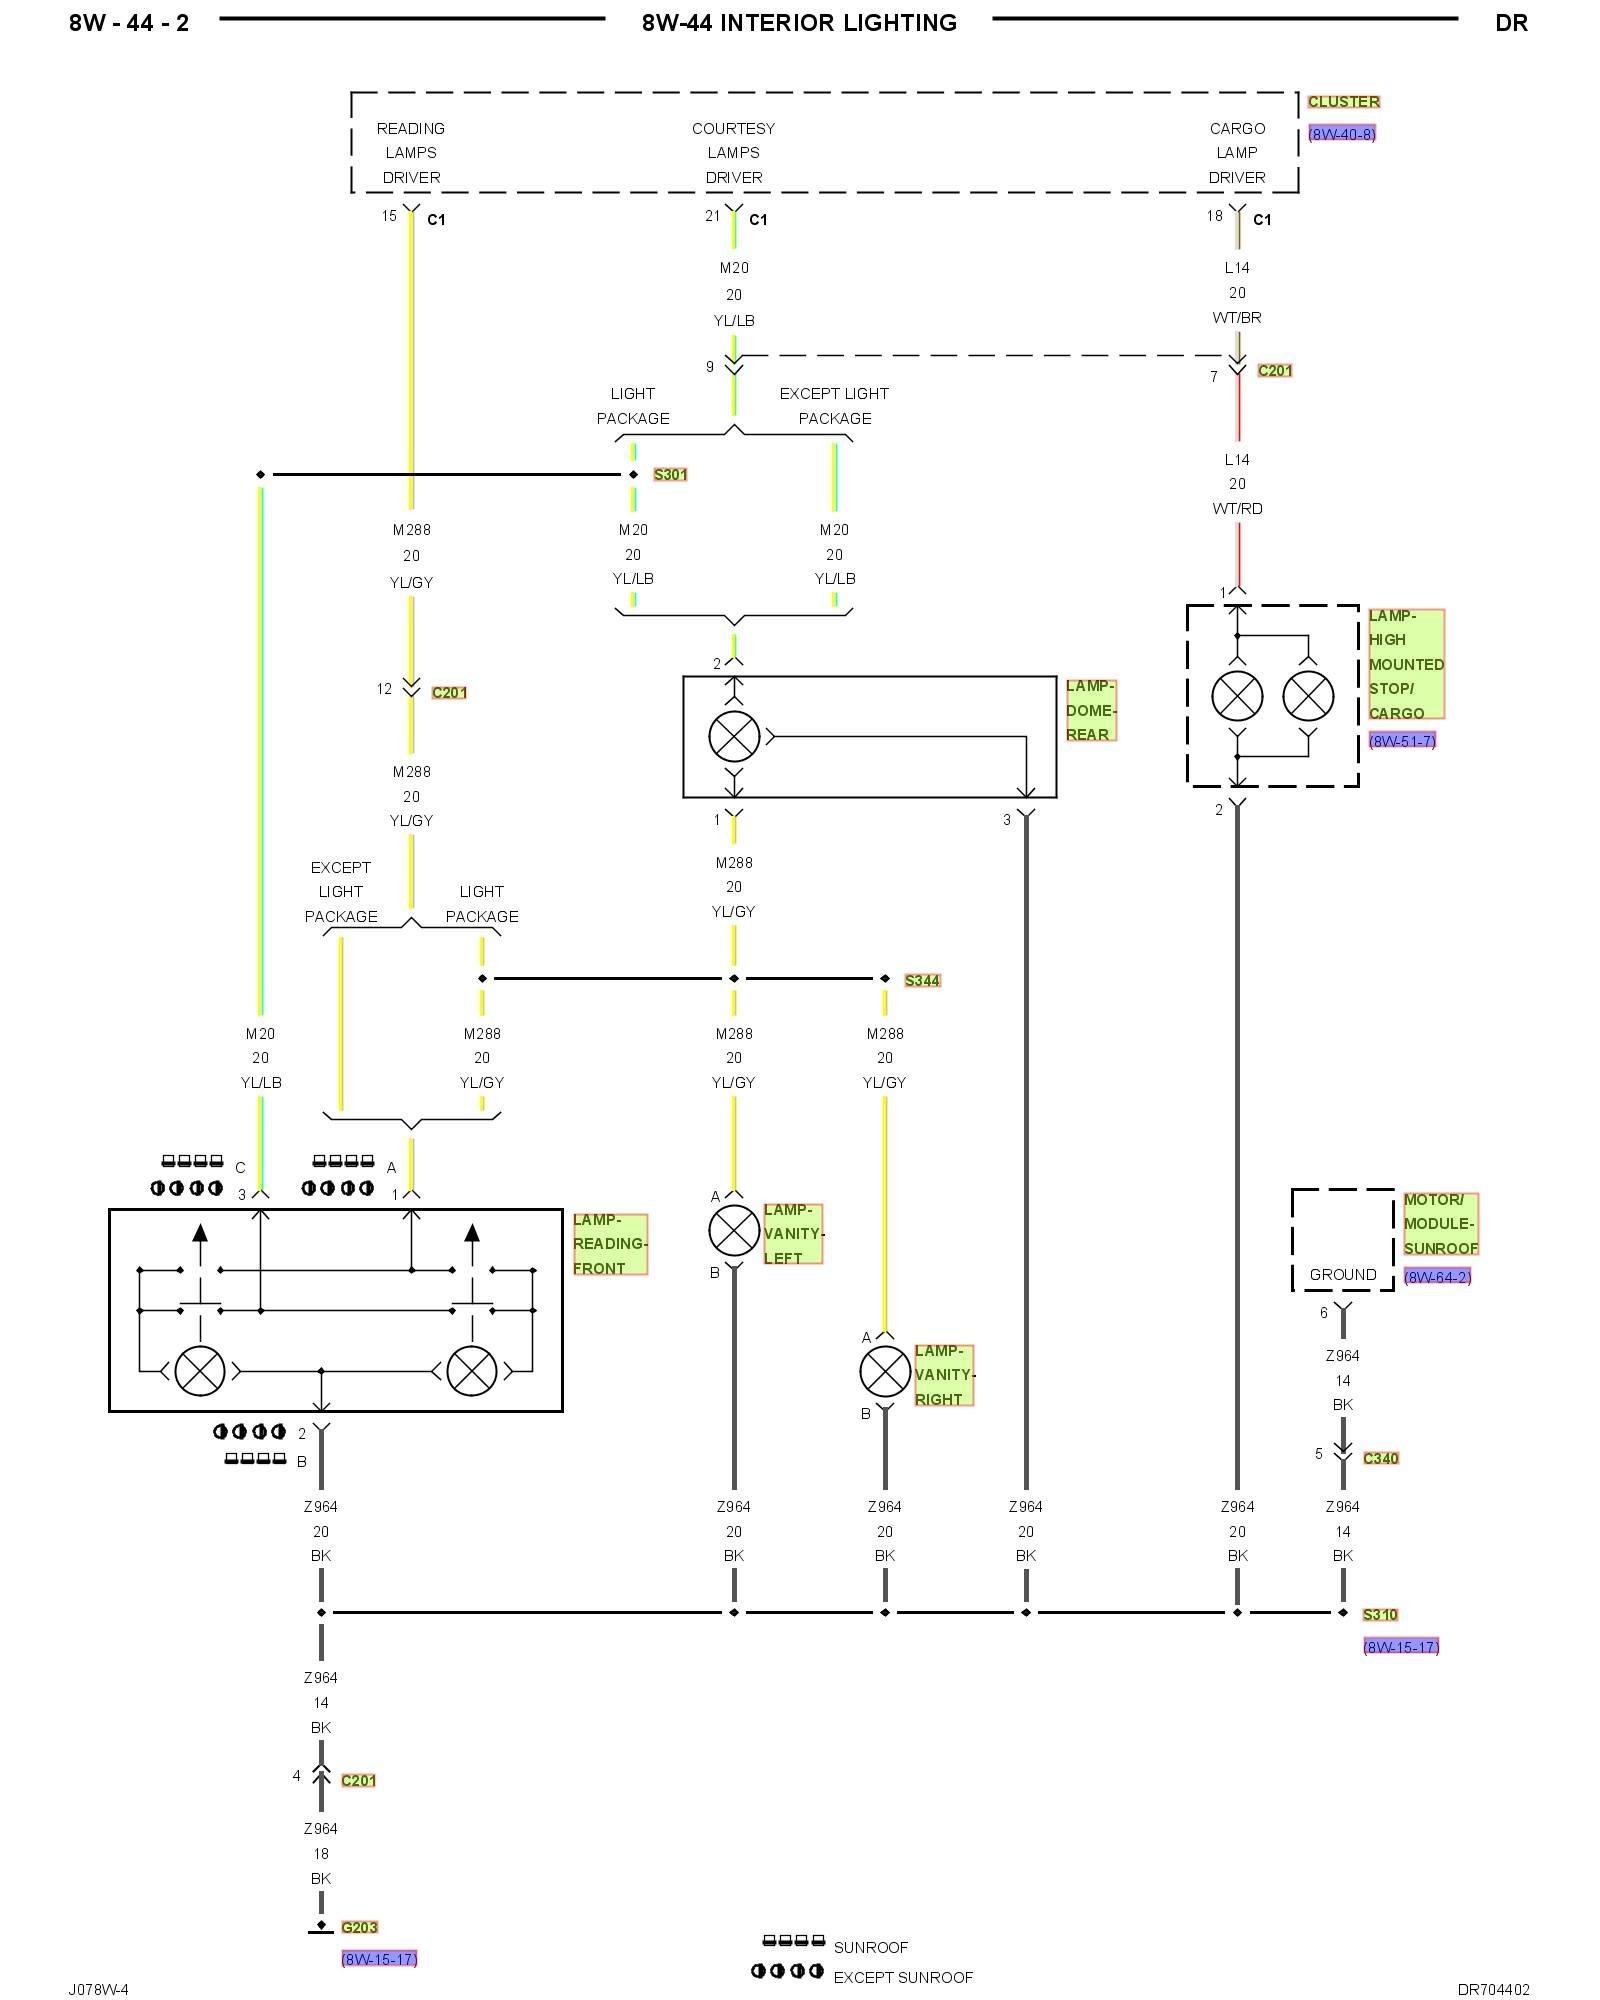 hight resolution of 2003 dodge ram electrical diagram wiring database 2004 dodge ram 1500 car radio wiring diagram dodge